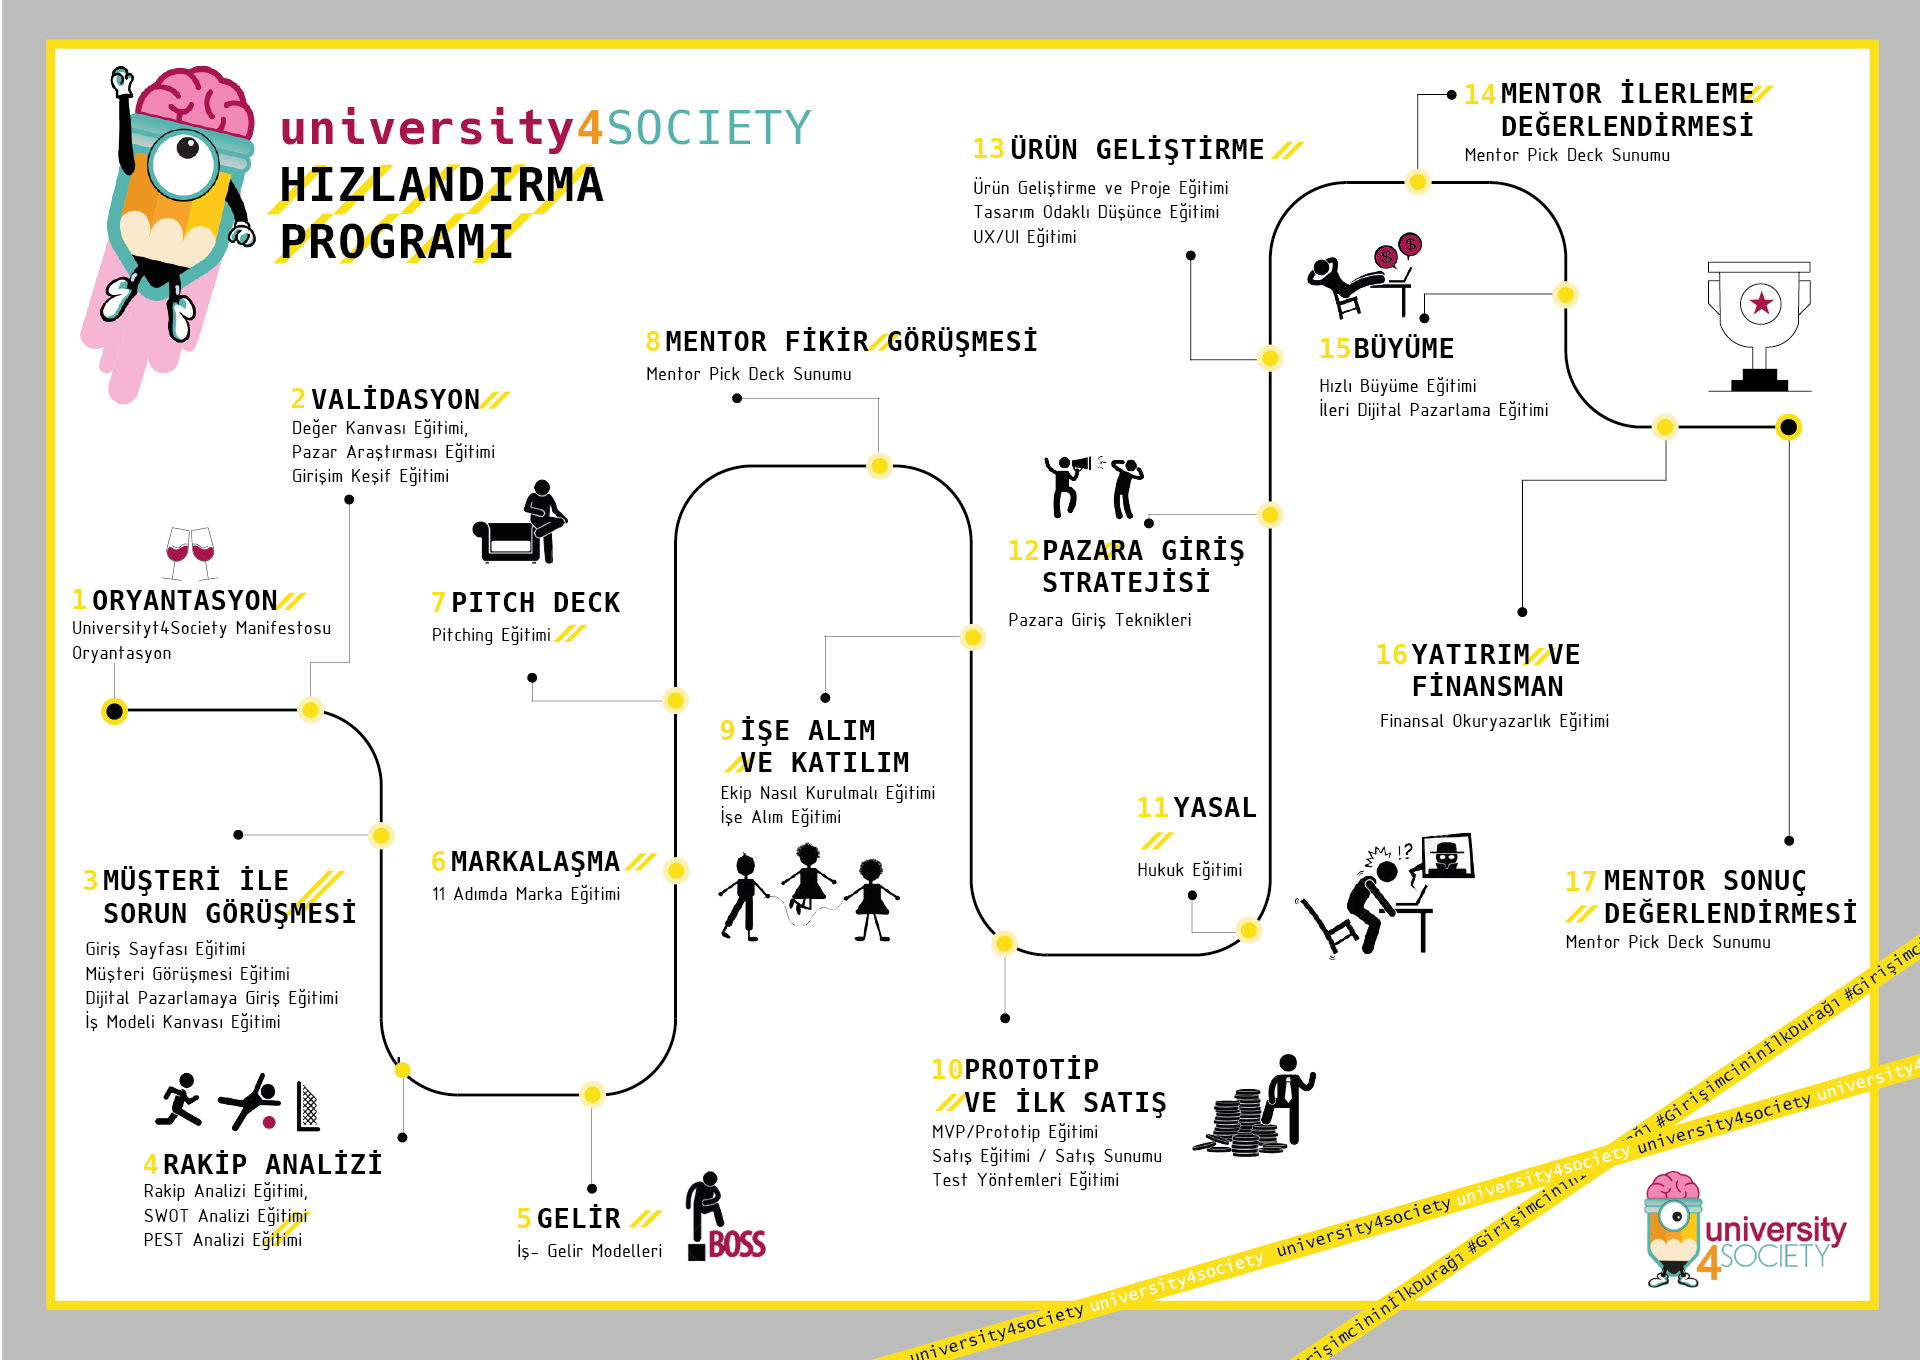 University4Society Hızlandırma Programı